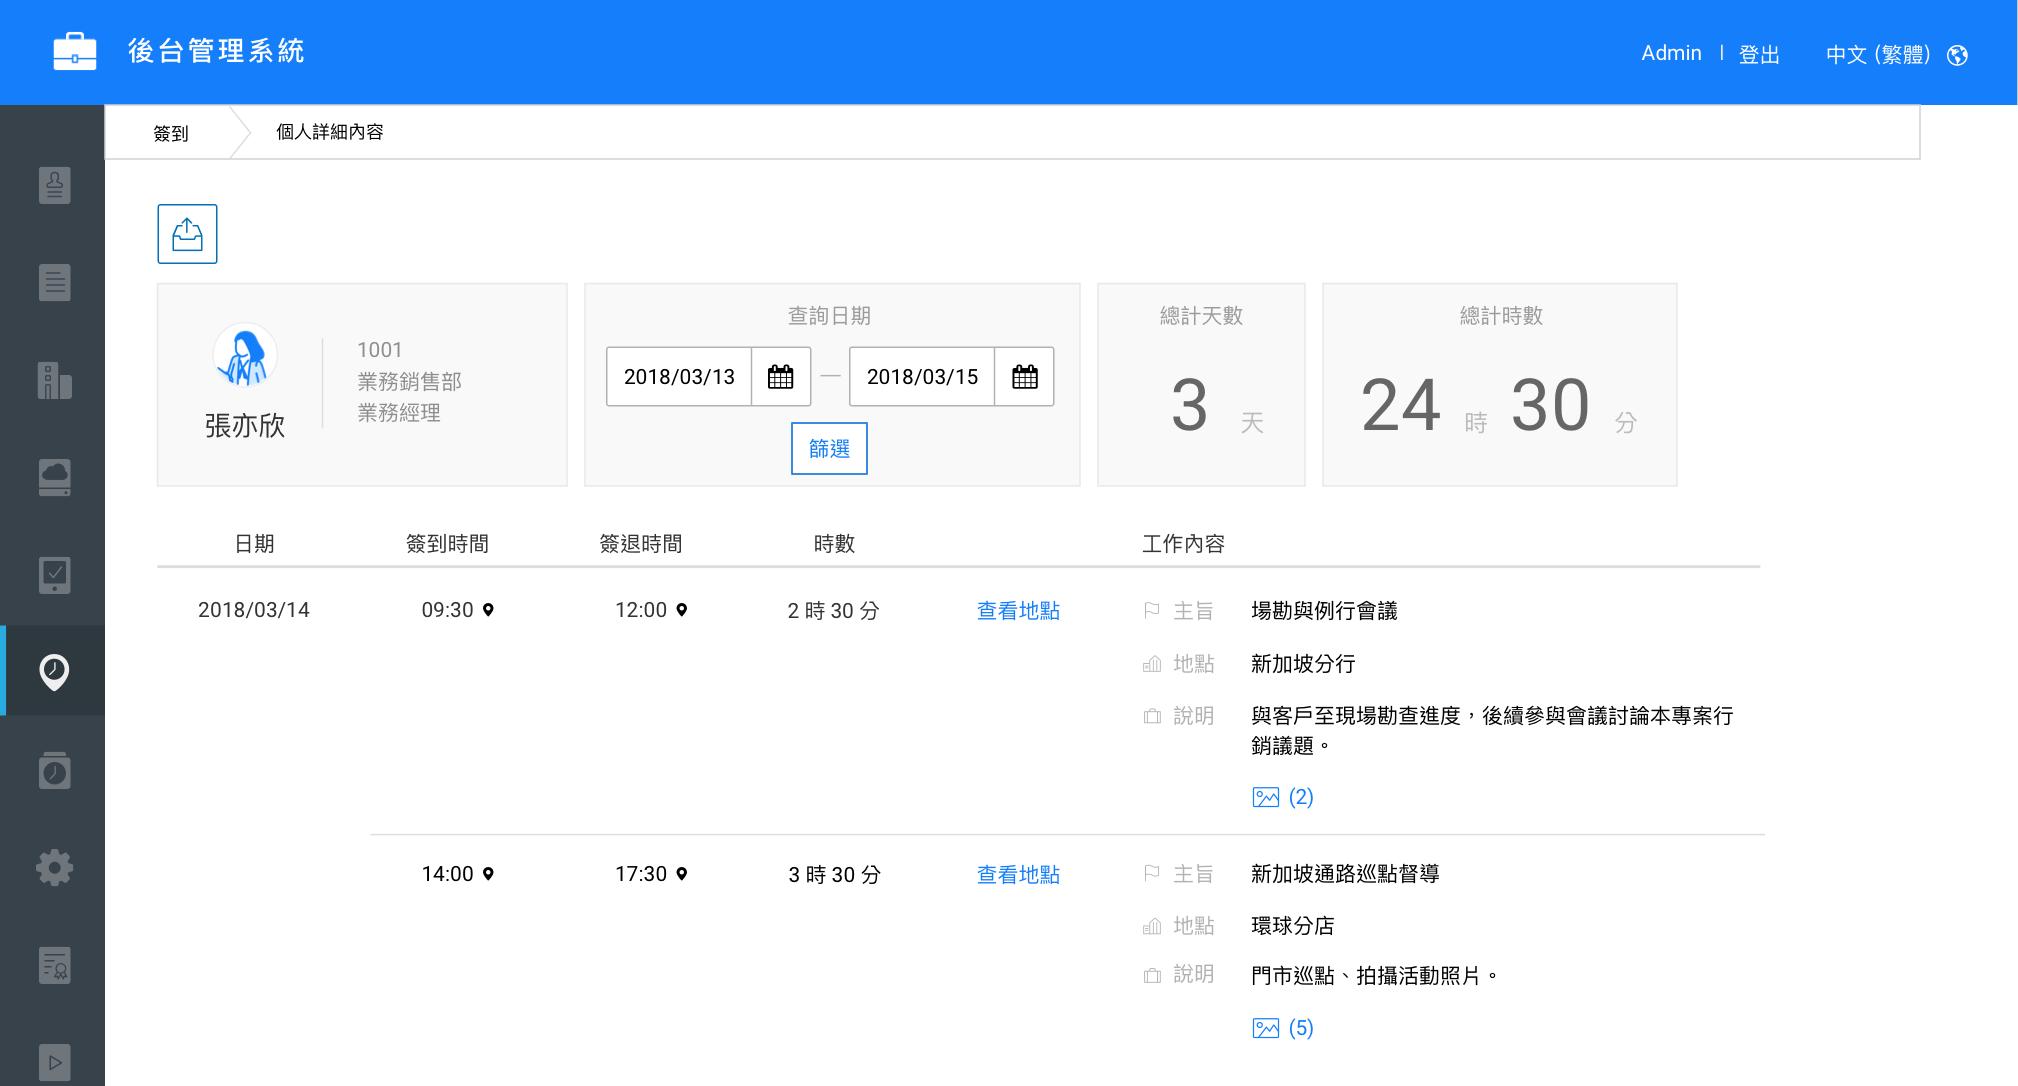 WorkLink 行動商務平臺 - 行動簽到功能介紹